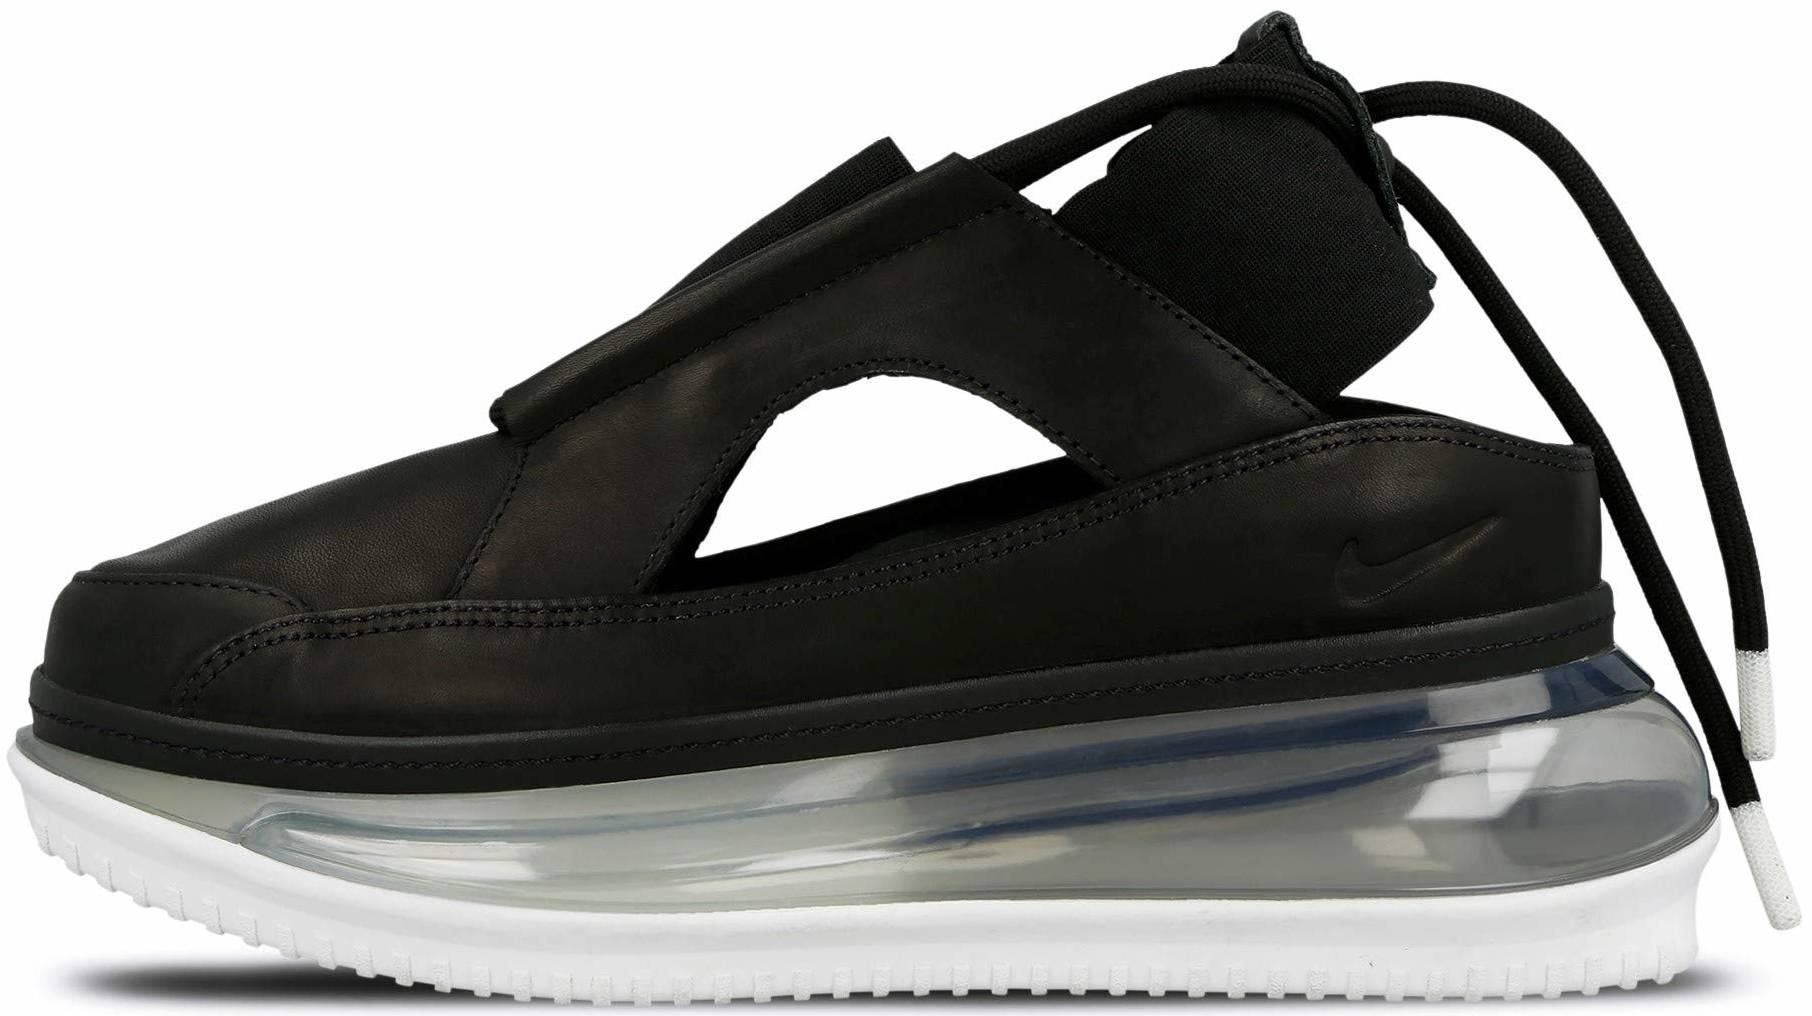 Nike Air Max Ff 720 Sneakers In Black Only 160 Runrepeat